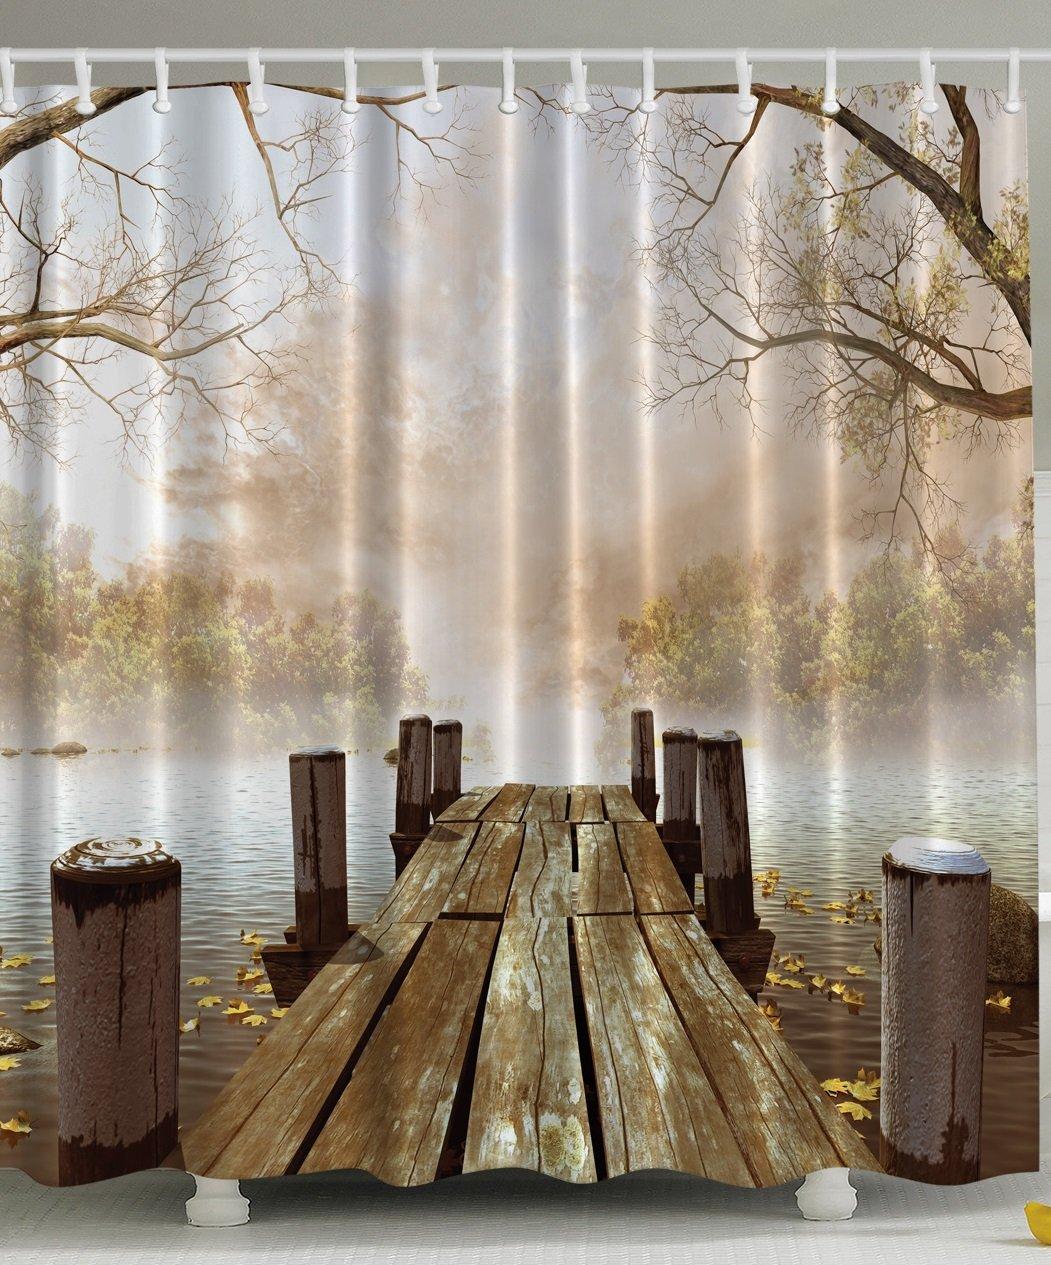 Shower curtain bathroom decor fall wooden bridge seasons for Bathroom decor nature